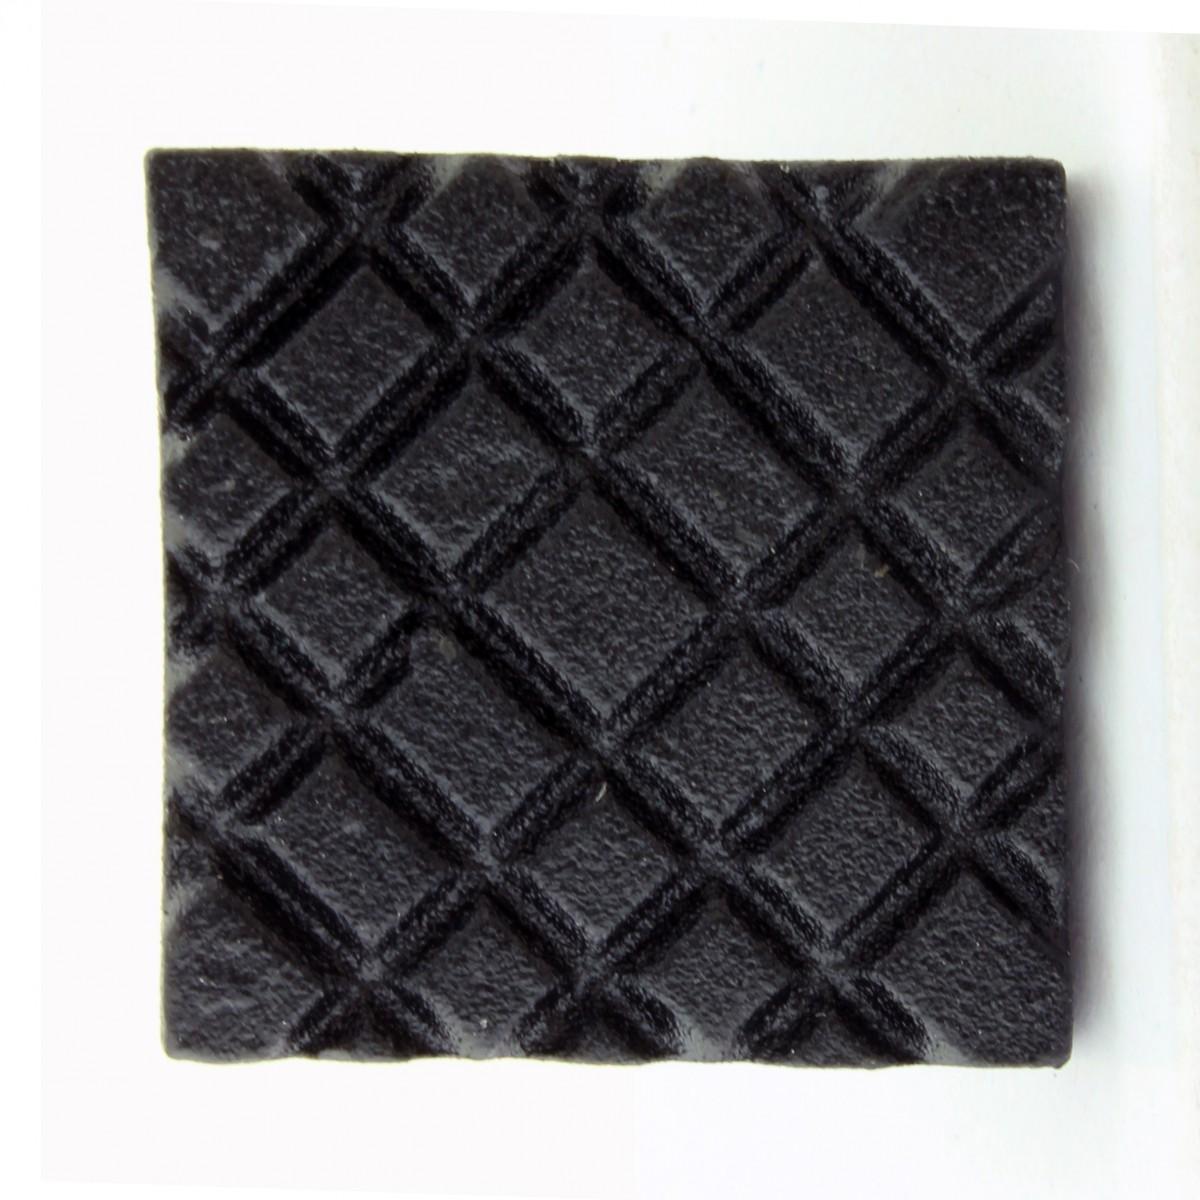 Square Diamond Grid Iron Cabinet Knob Black Pack of 4 Cabinet Knob Iron Cabinet Knob Cabinet Knob Black